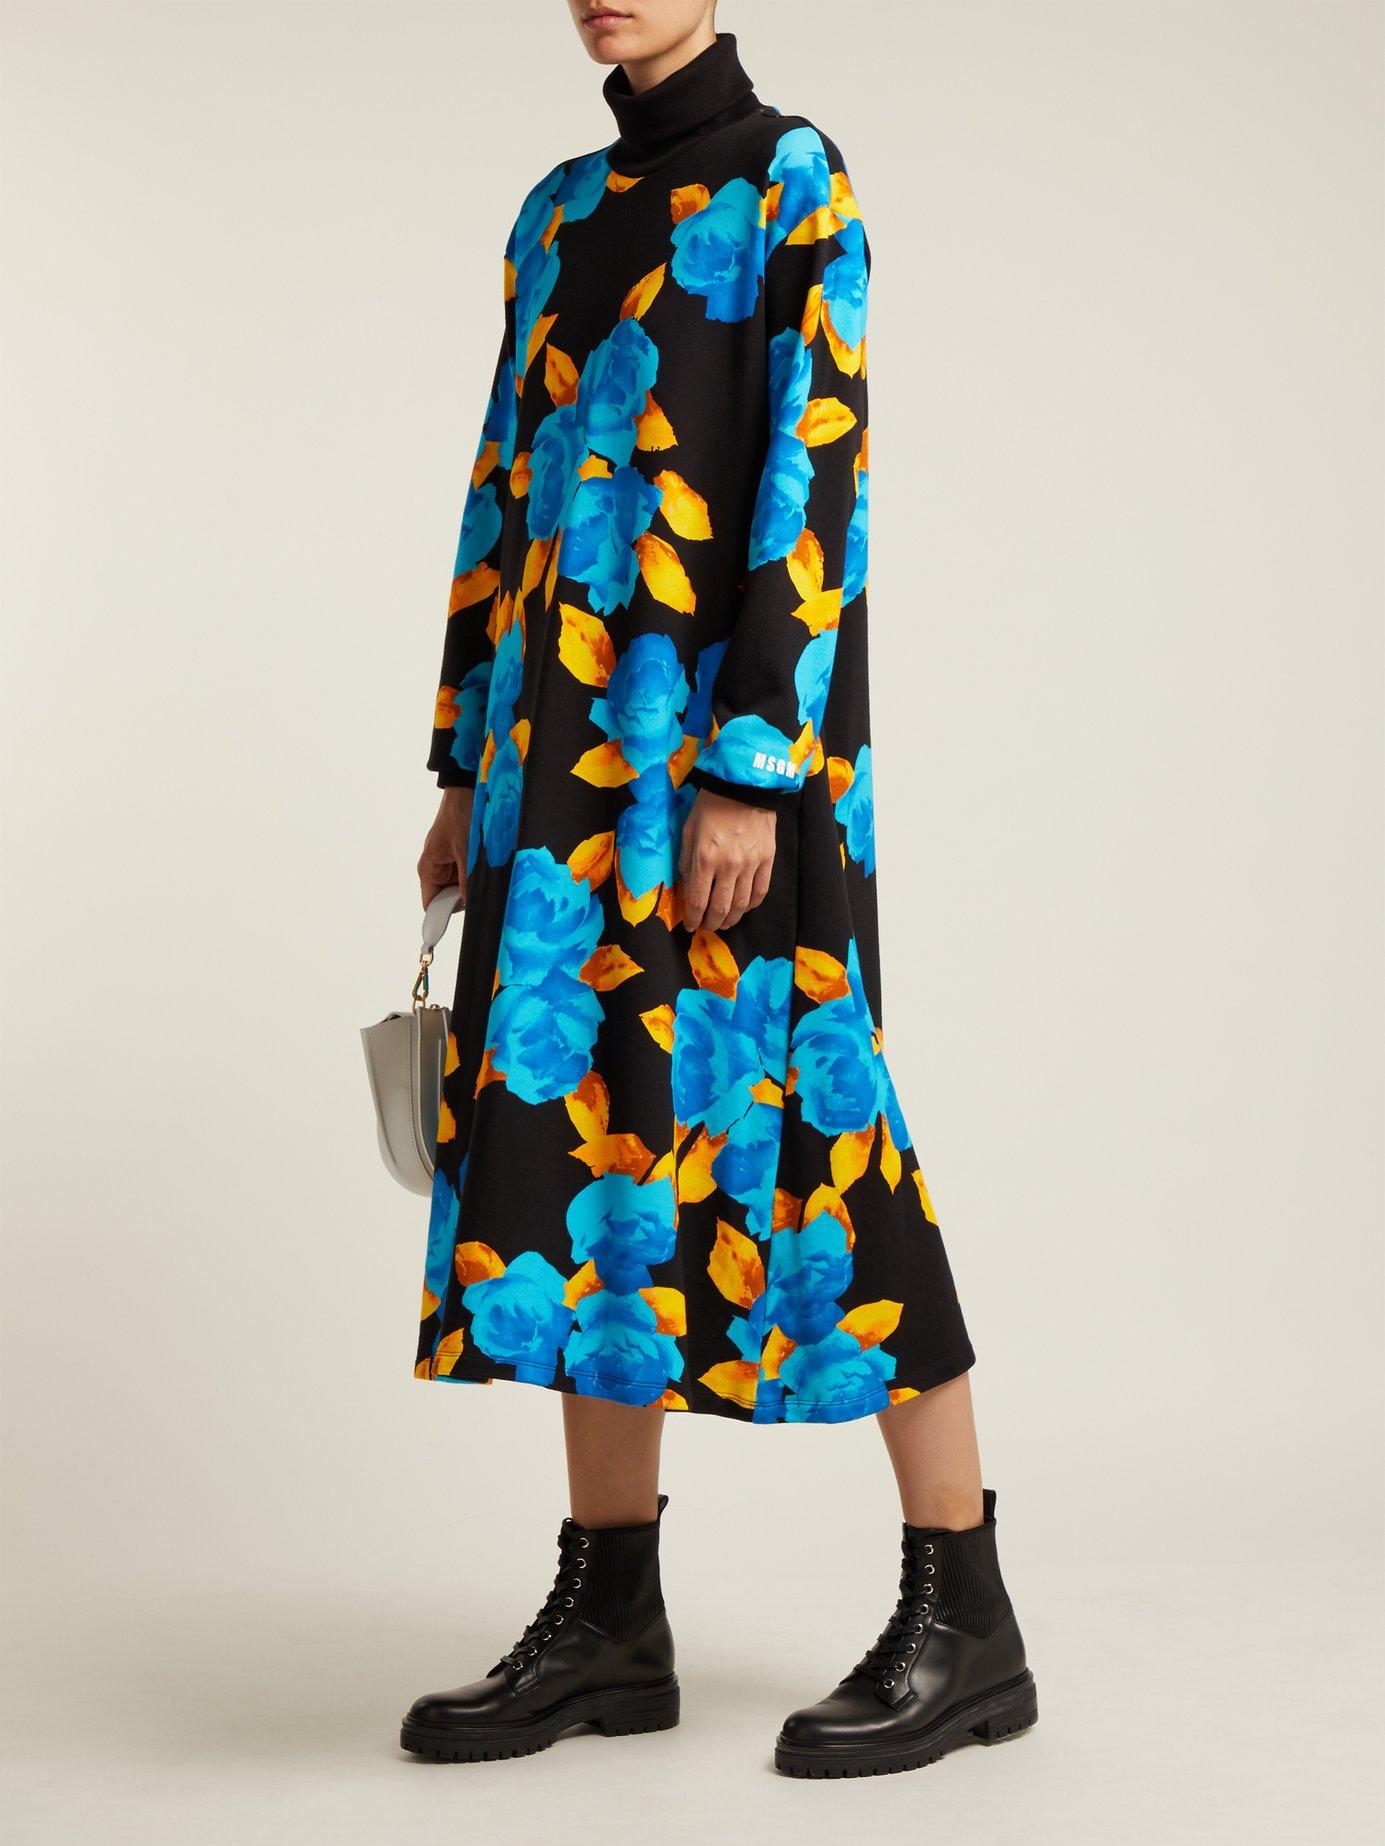 Floral-print cotton-jersey dress by Msgm